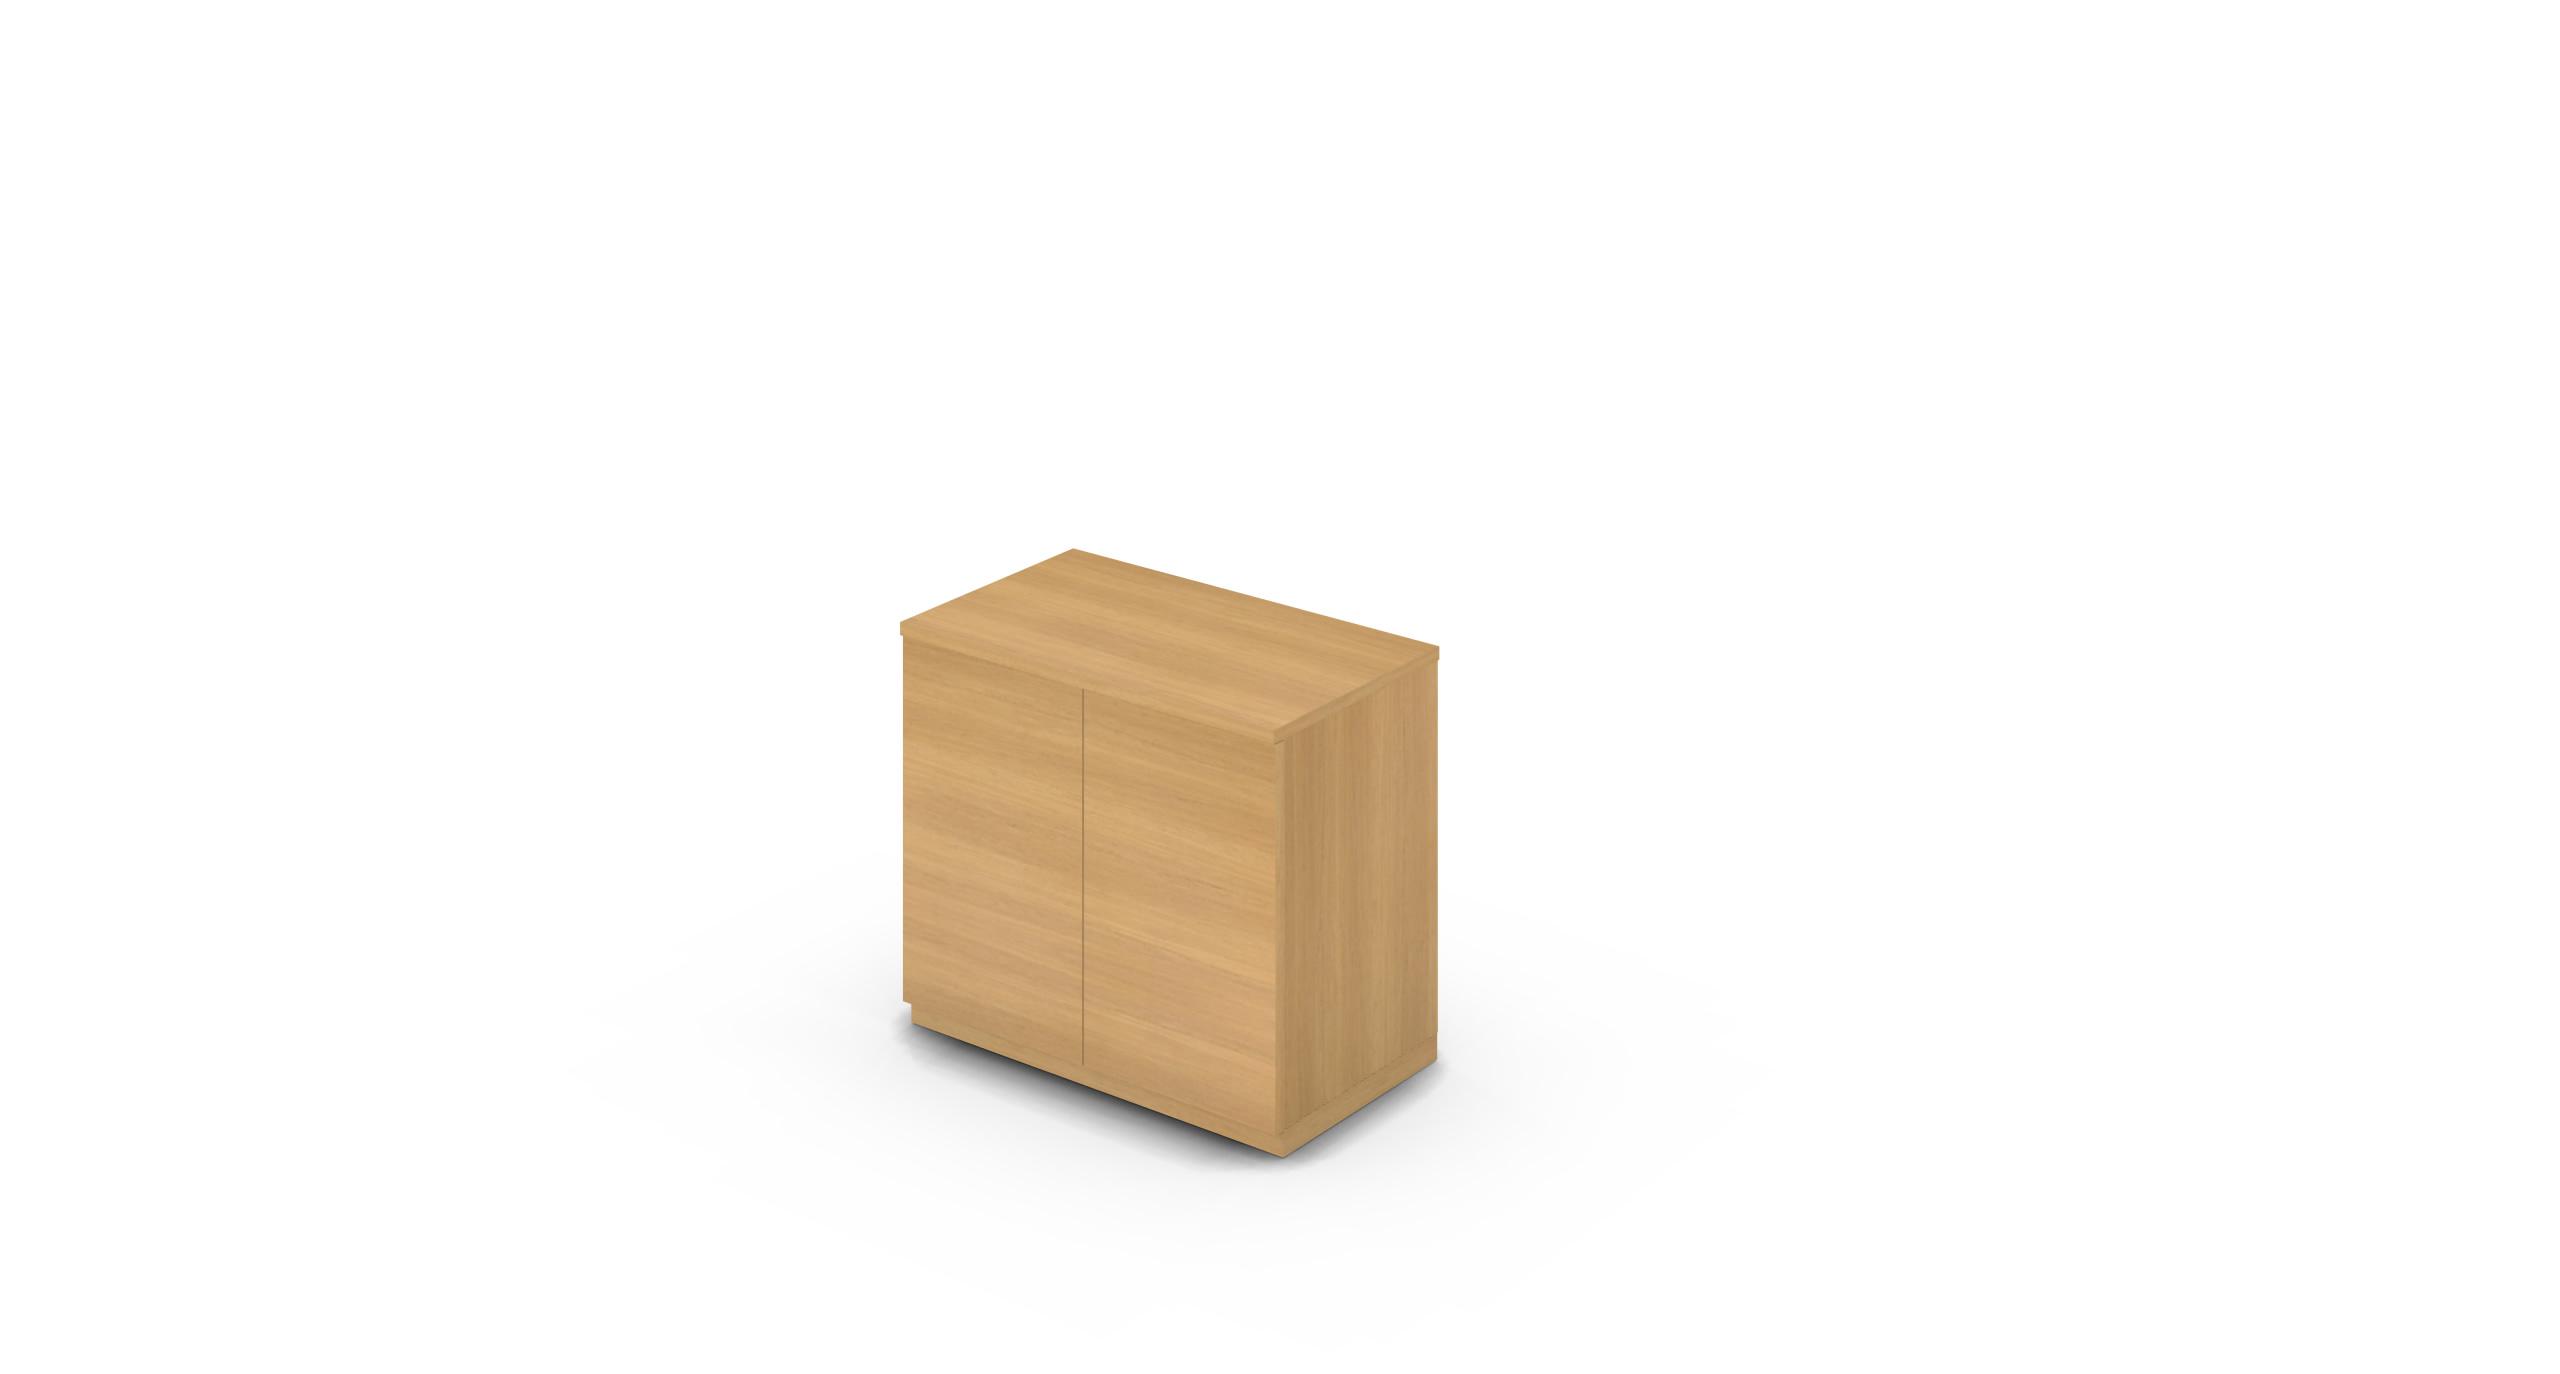 Cabinet_800x450x775_HD_Oak_Push_NoCylinder